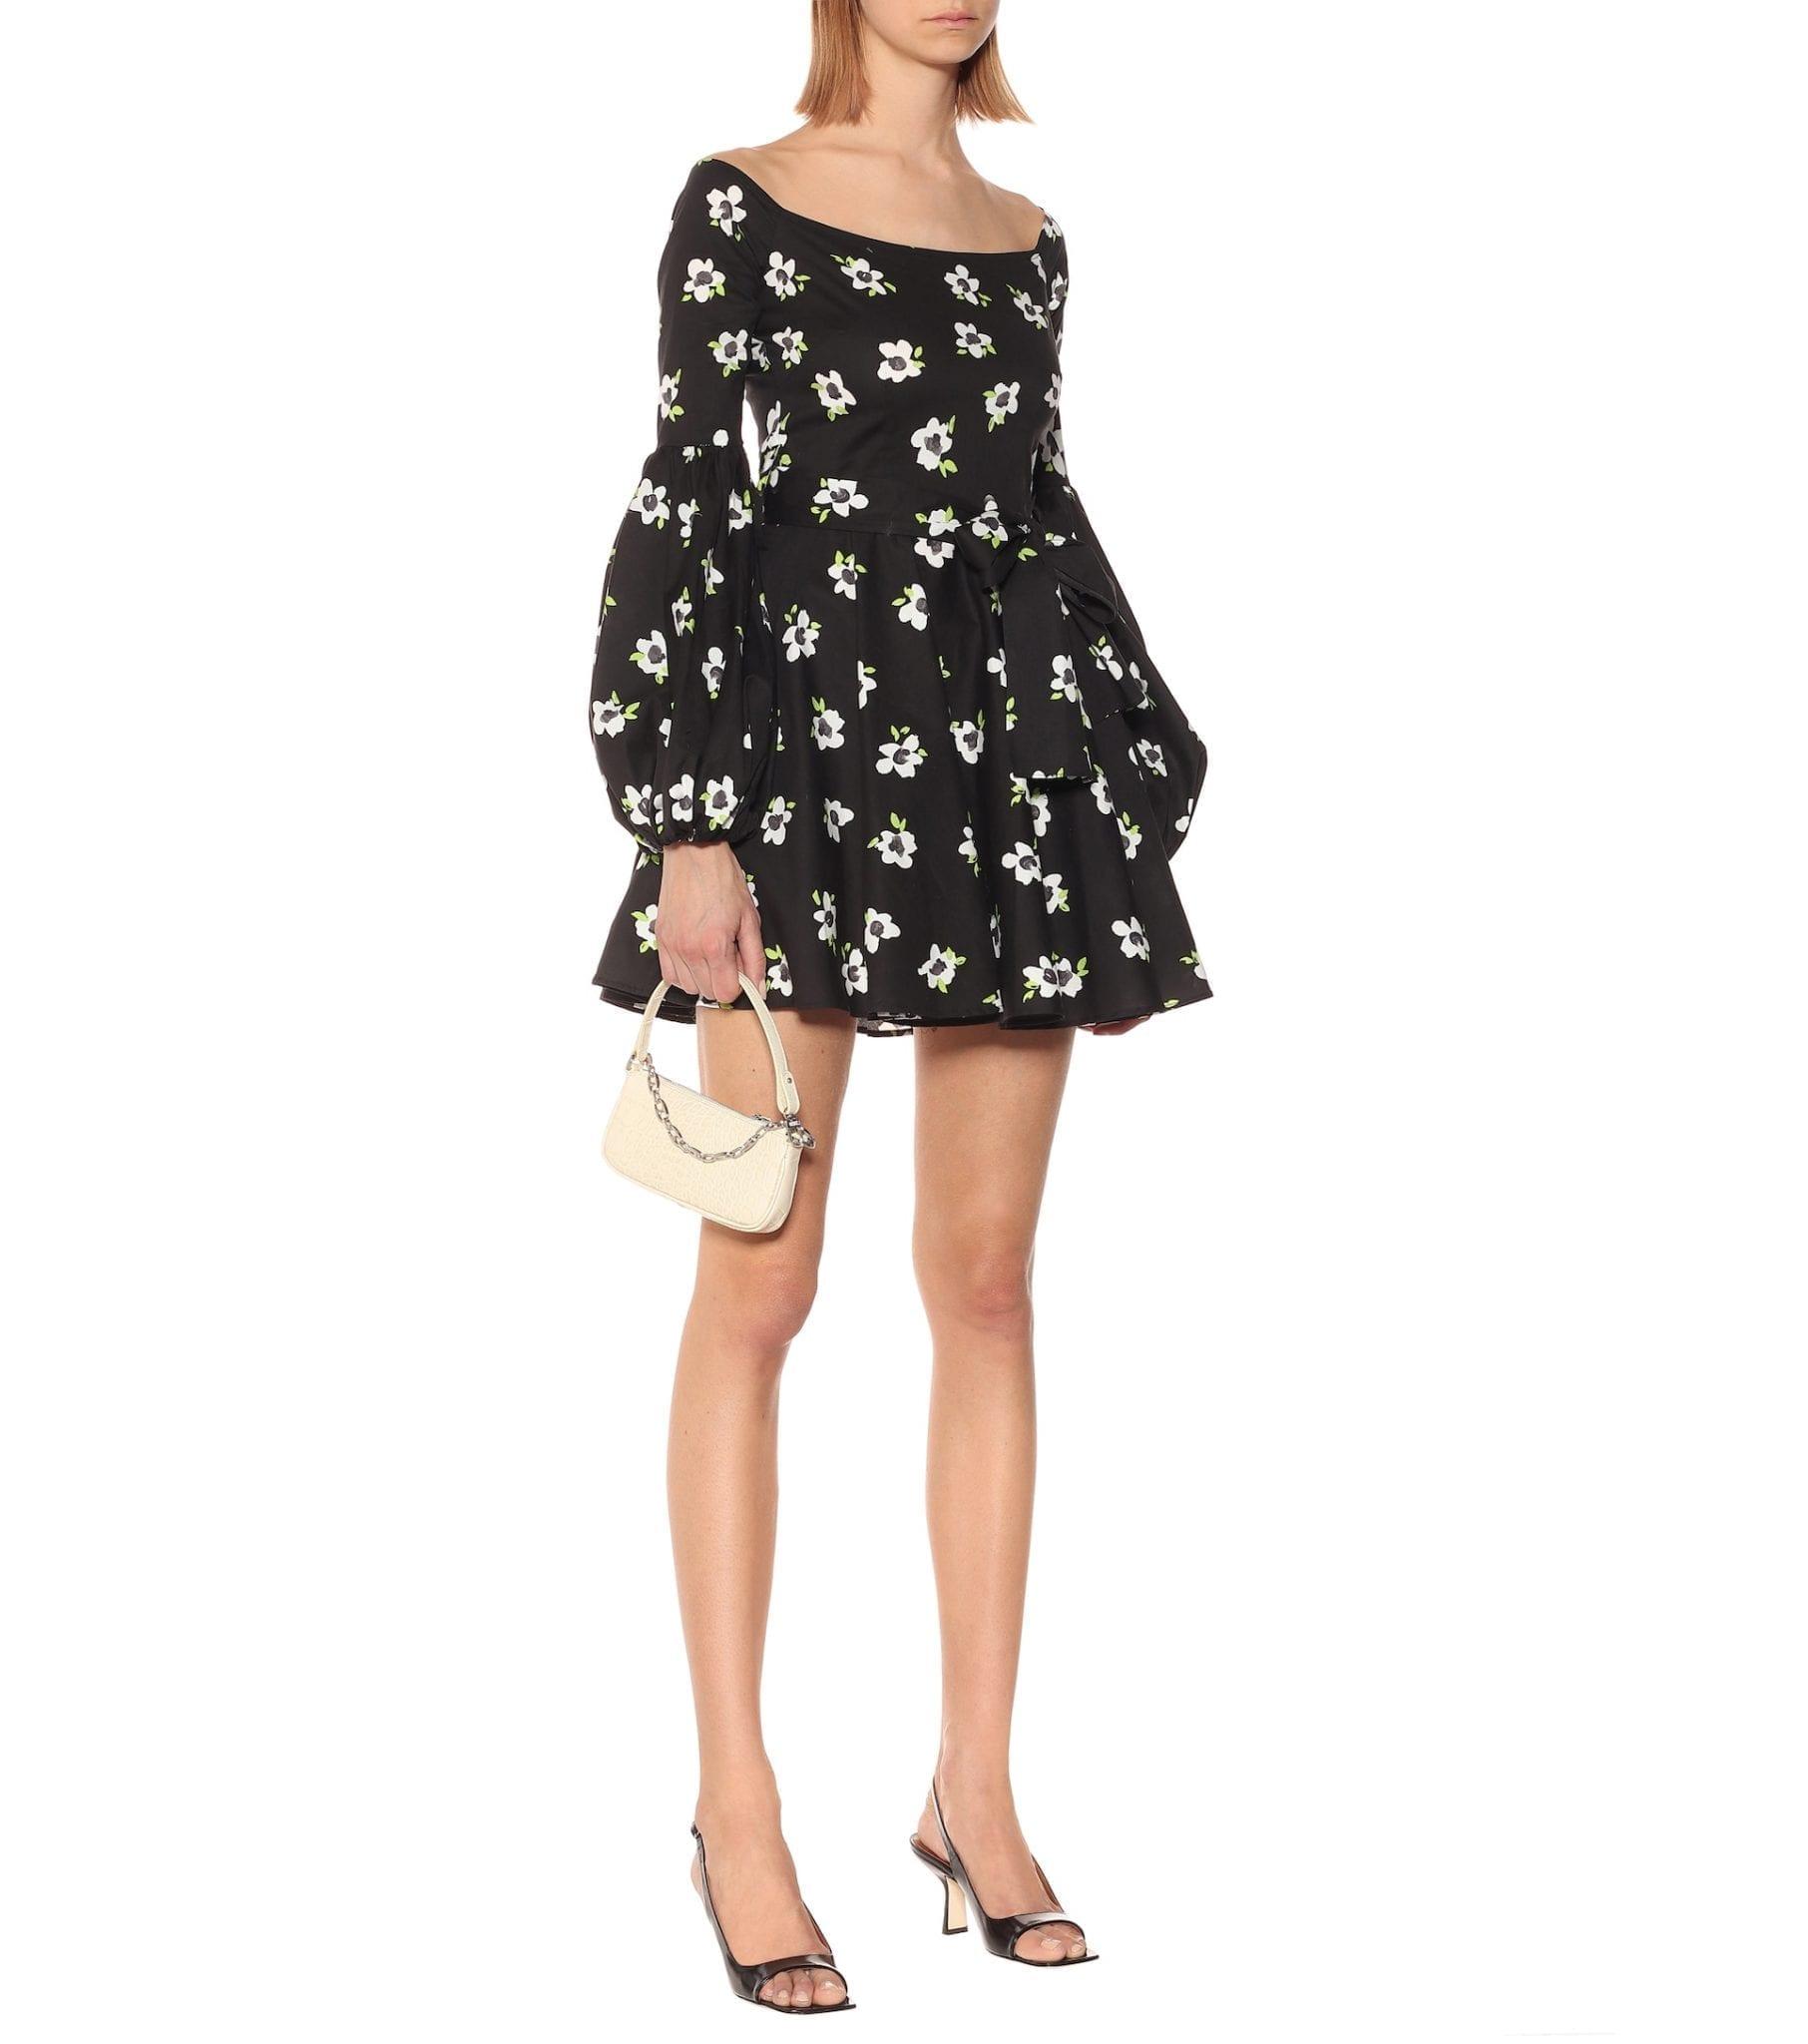 CAROLINE CONSTAS Gisele Floral Cotton Mini Dress